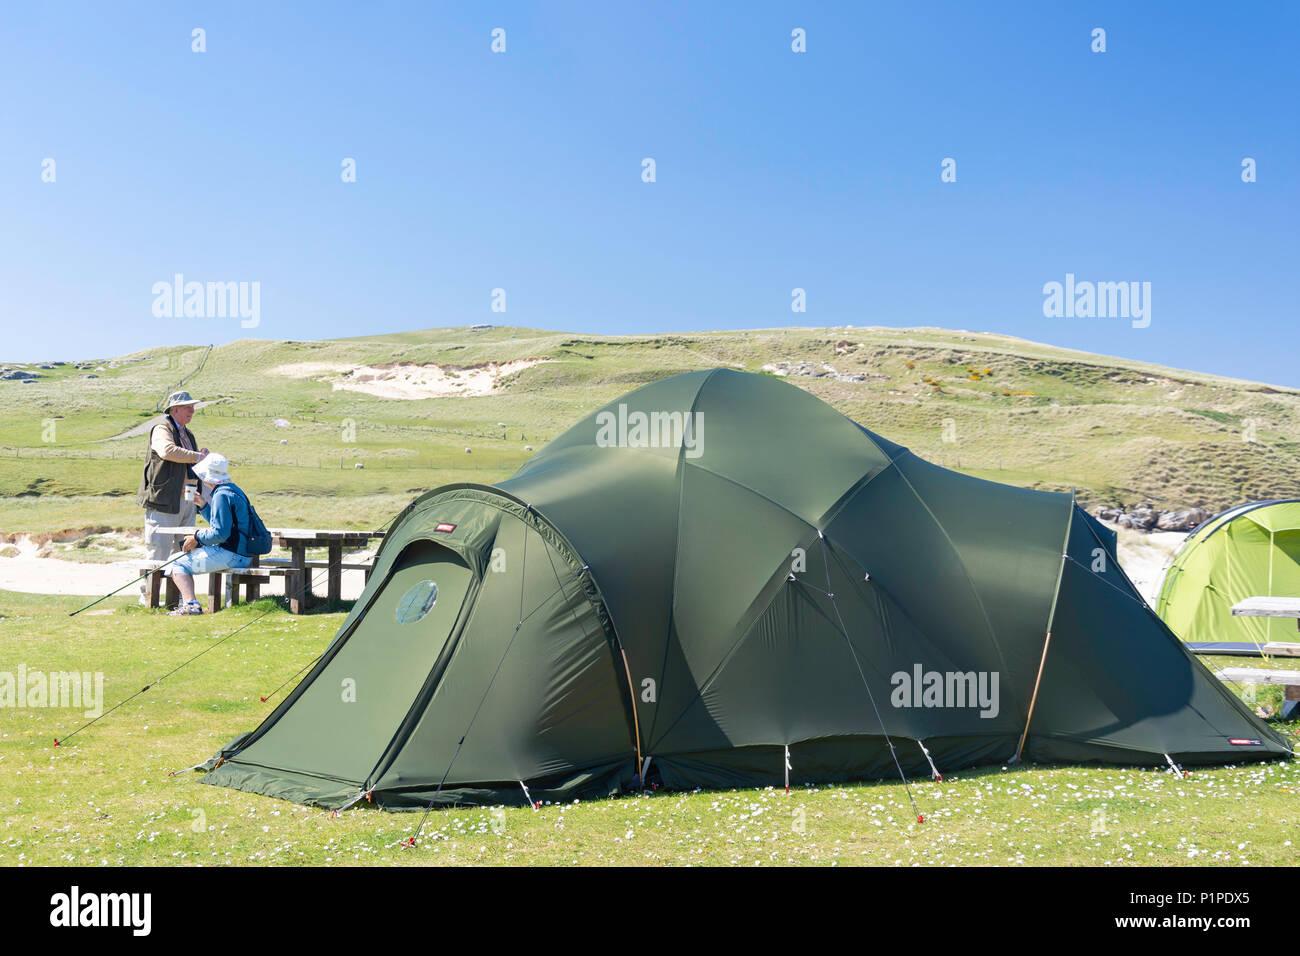 Traigh Horgabost Campsite, Isle of Harris, Outer Hebrides, Na h-Eileanan Siar, Scotland, United Kingdom - Stock Image